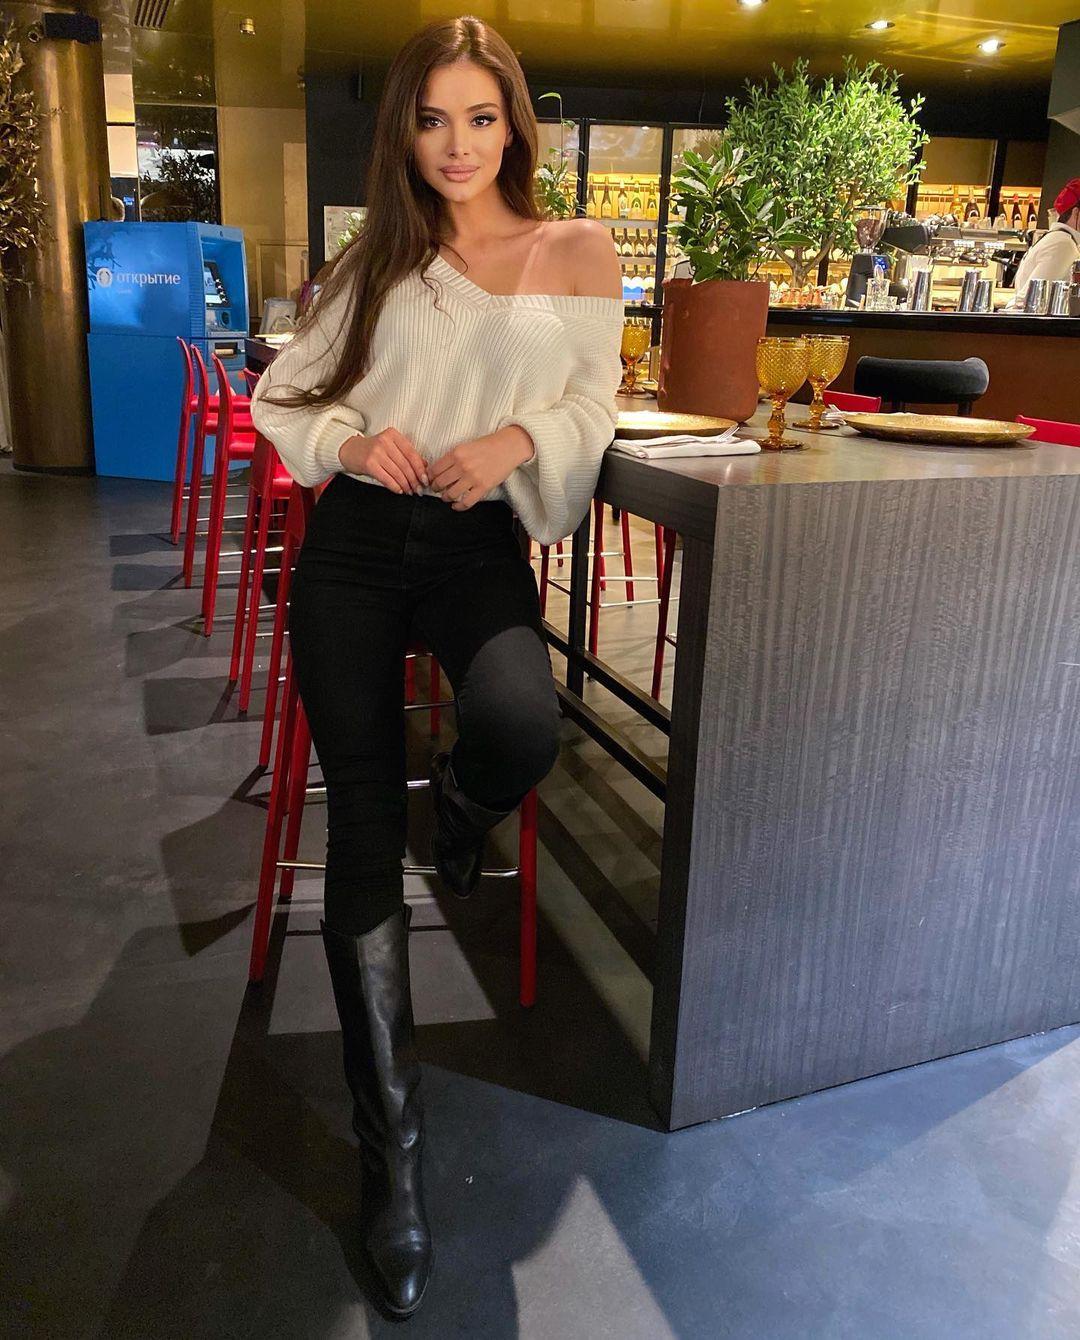 Christina-Alb-Wallpapers-Insta-Fit-Bio-4